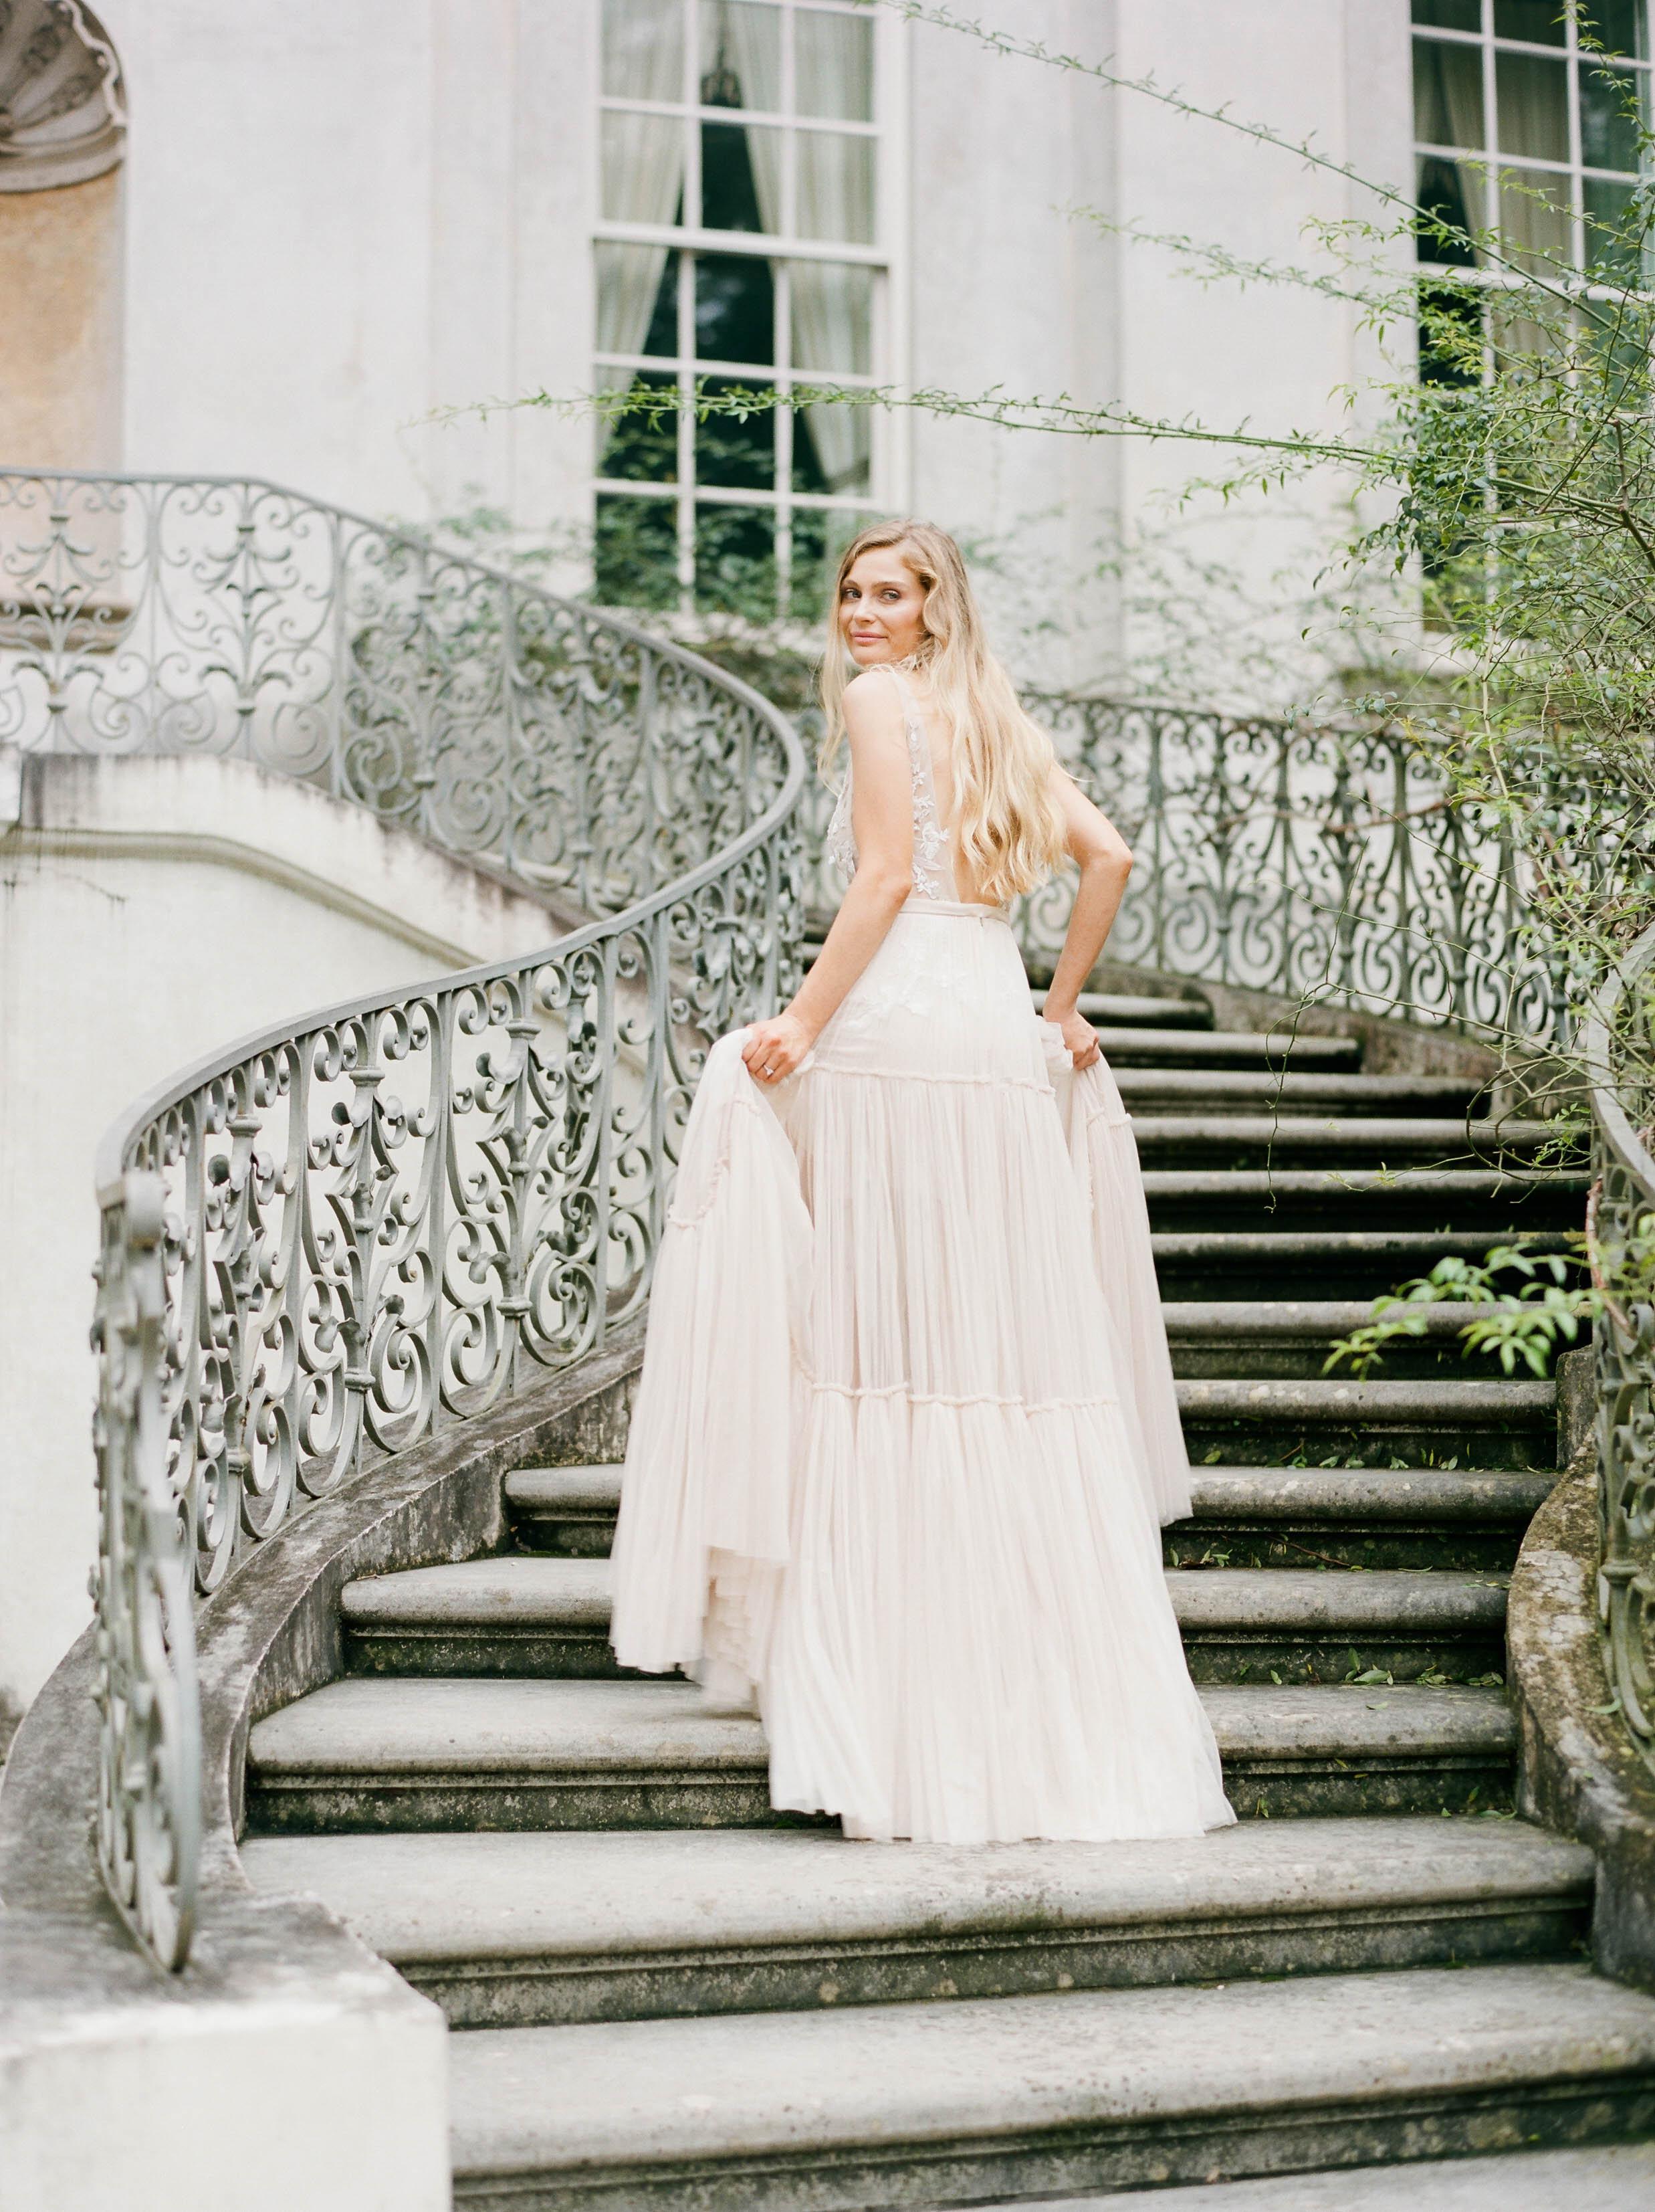 Swan House Wedding | Whitney Heard Photography | Tulle and Grace | Tristan Needham Design | Same Sex Marriage | Love is Love | Fine Art Wedding Blog | Berta